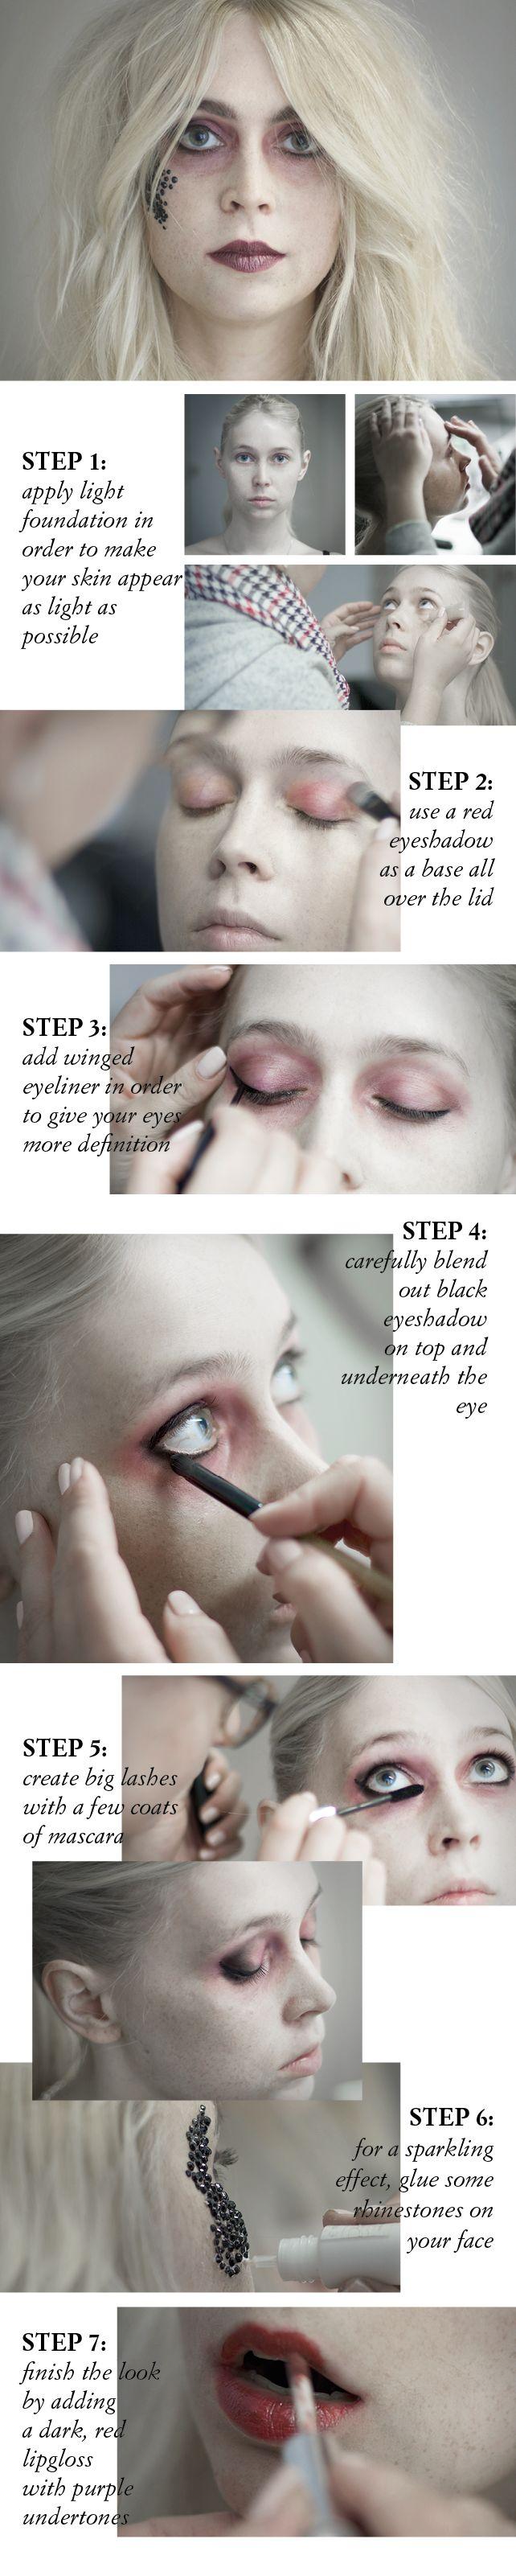 50 best Halloween makeup images on Pinterest | Make up, Halloween ...